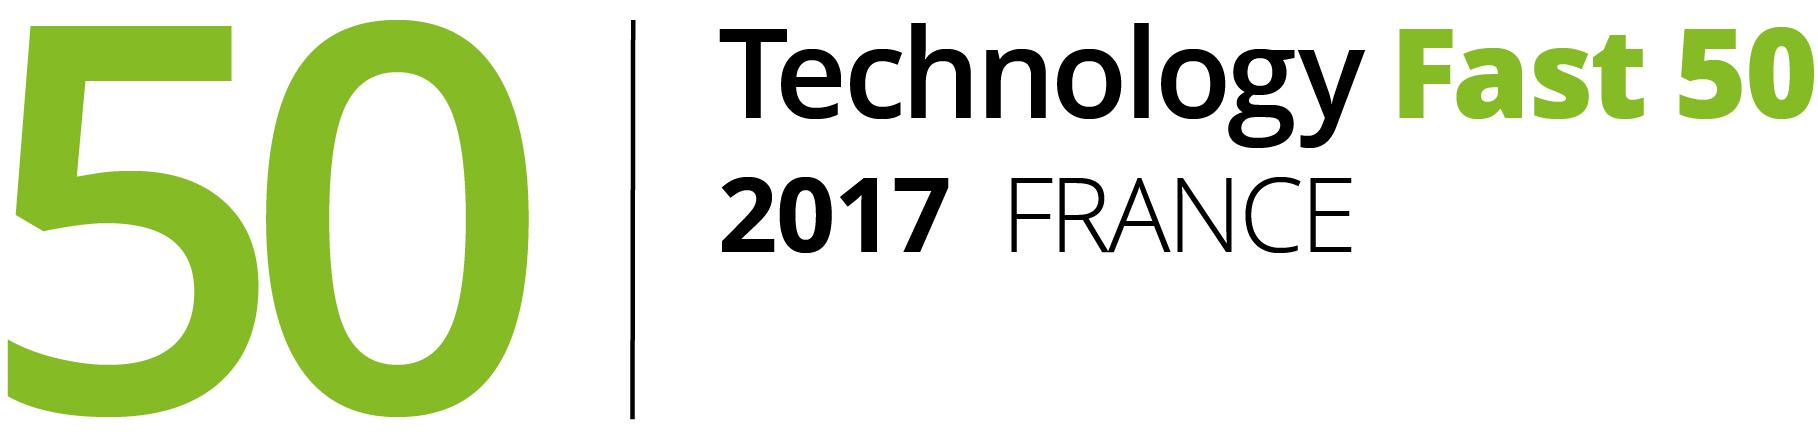 logo2017Fast50